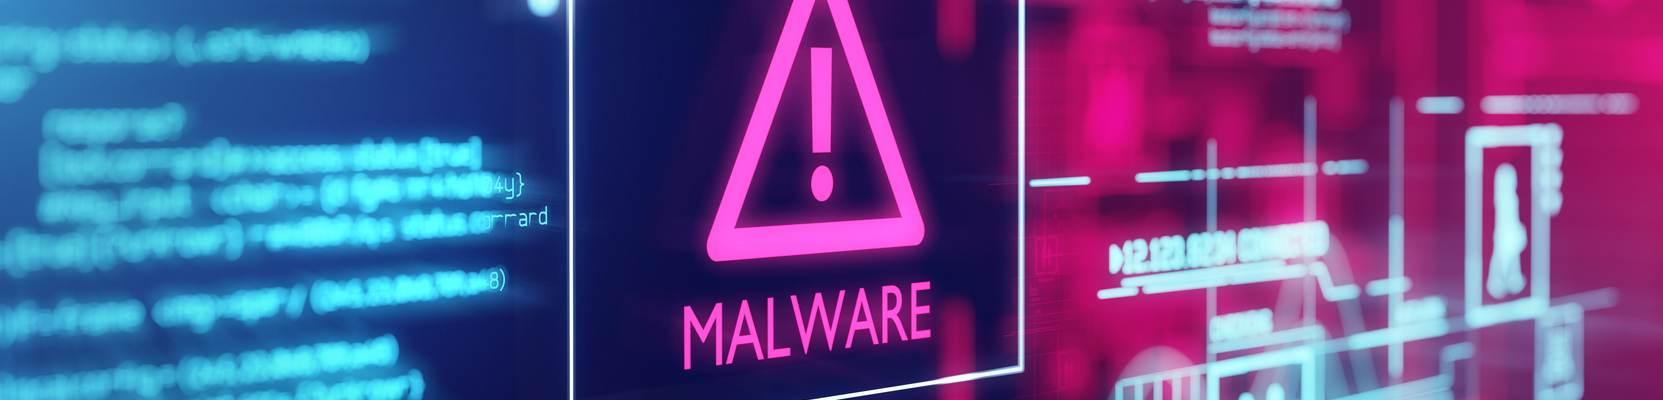 malware apple